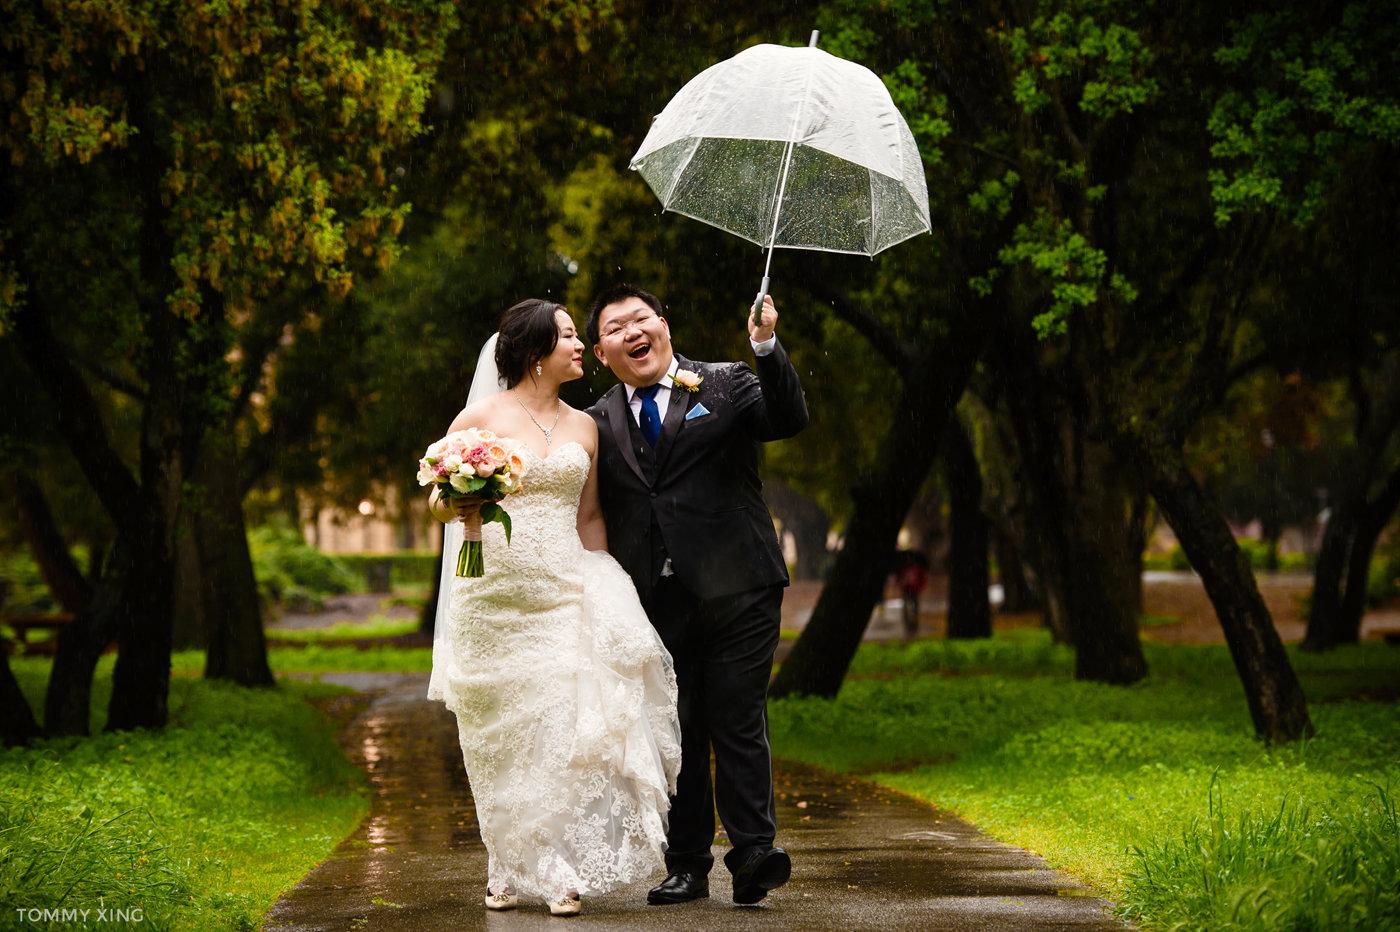 STANFORD MEMORIAL CHURCH WEDDING - Wenjie & Chengcheng - SAN FRANCISCO BAY AREA 斯坦福教堂婚礼跟拍 - 洛杉矶婚礼婚纱照摄影师 Tommy Xing Photography167.jpg